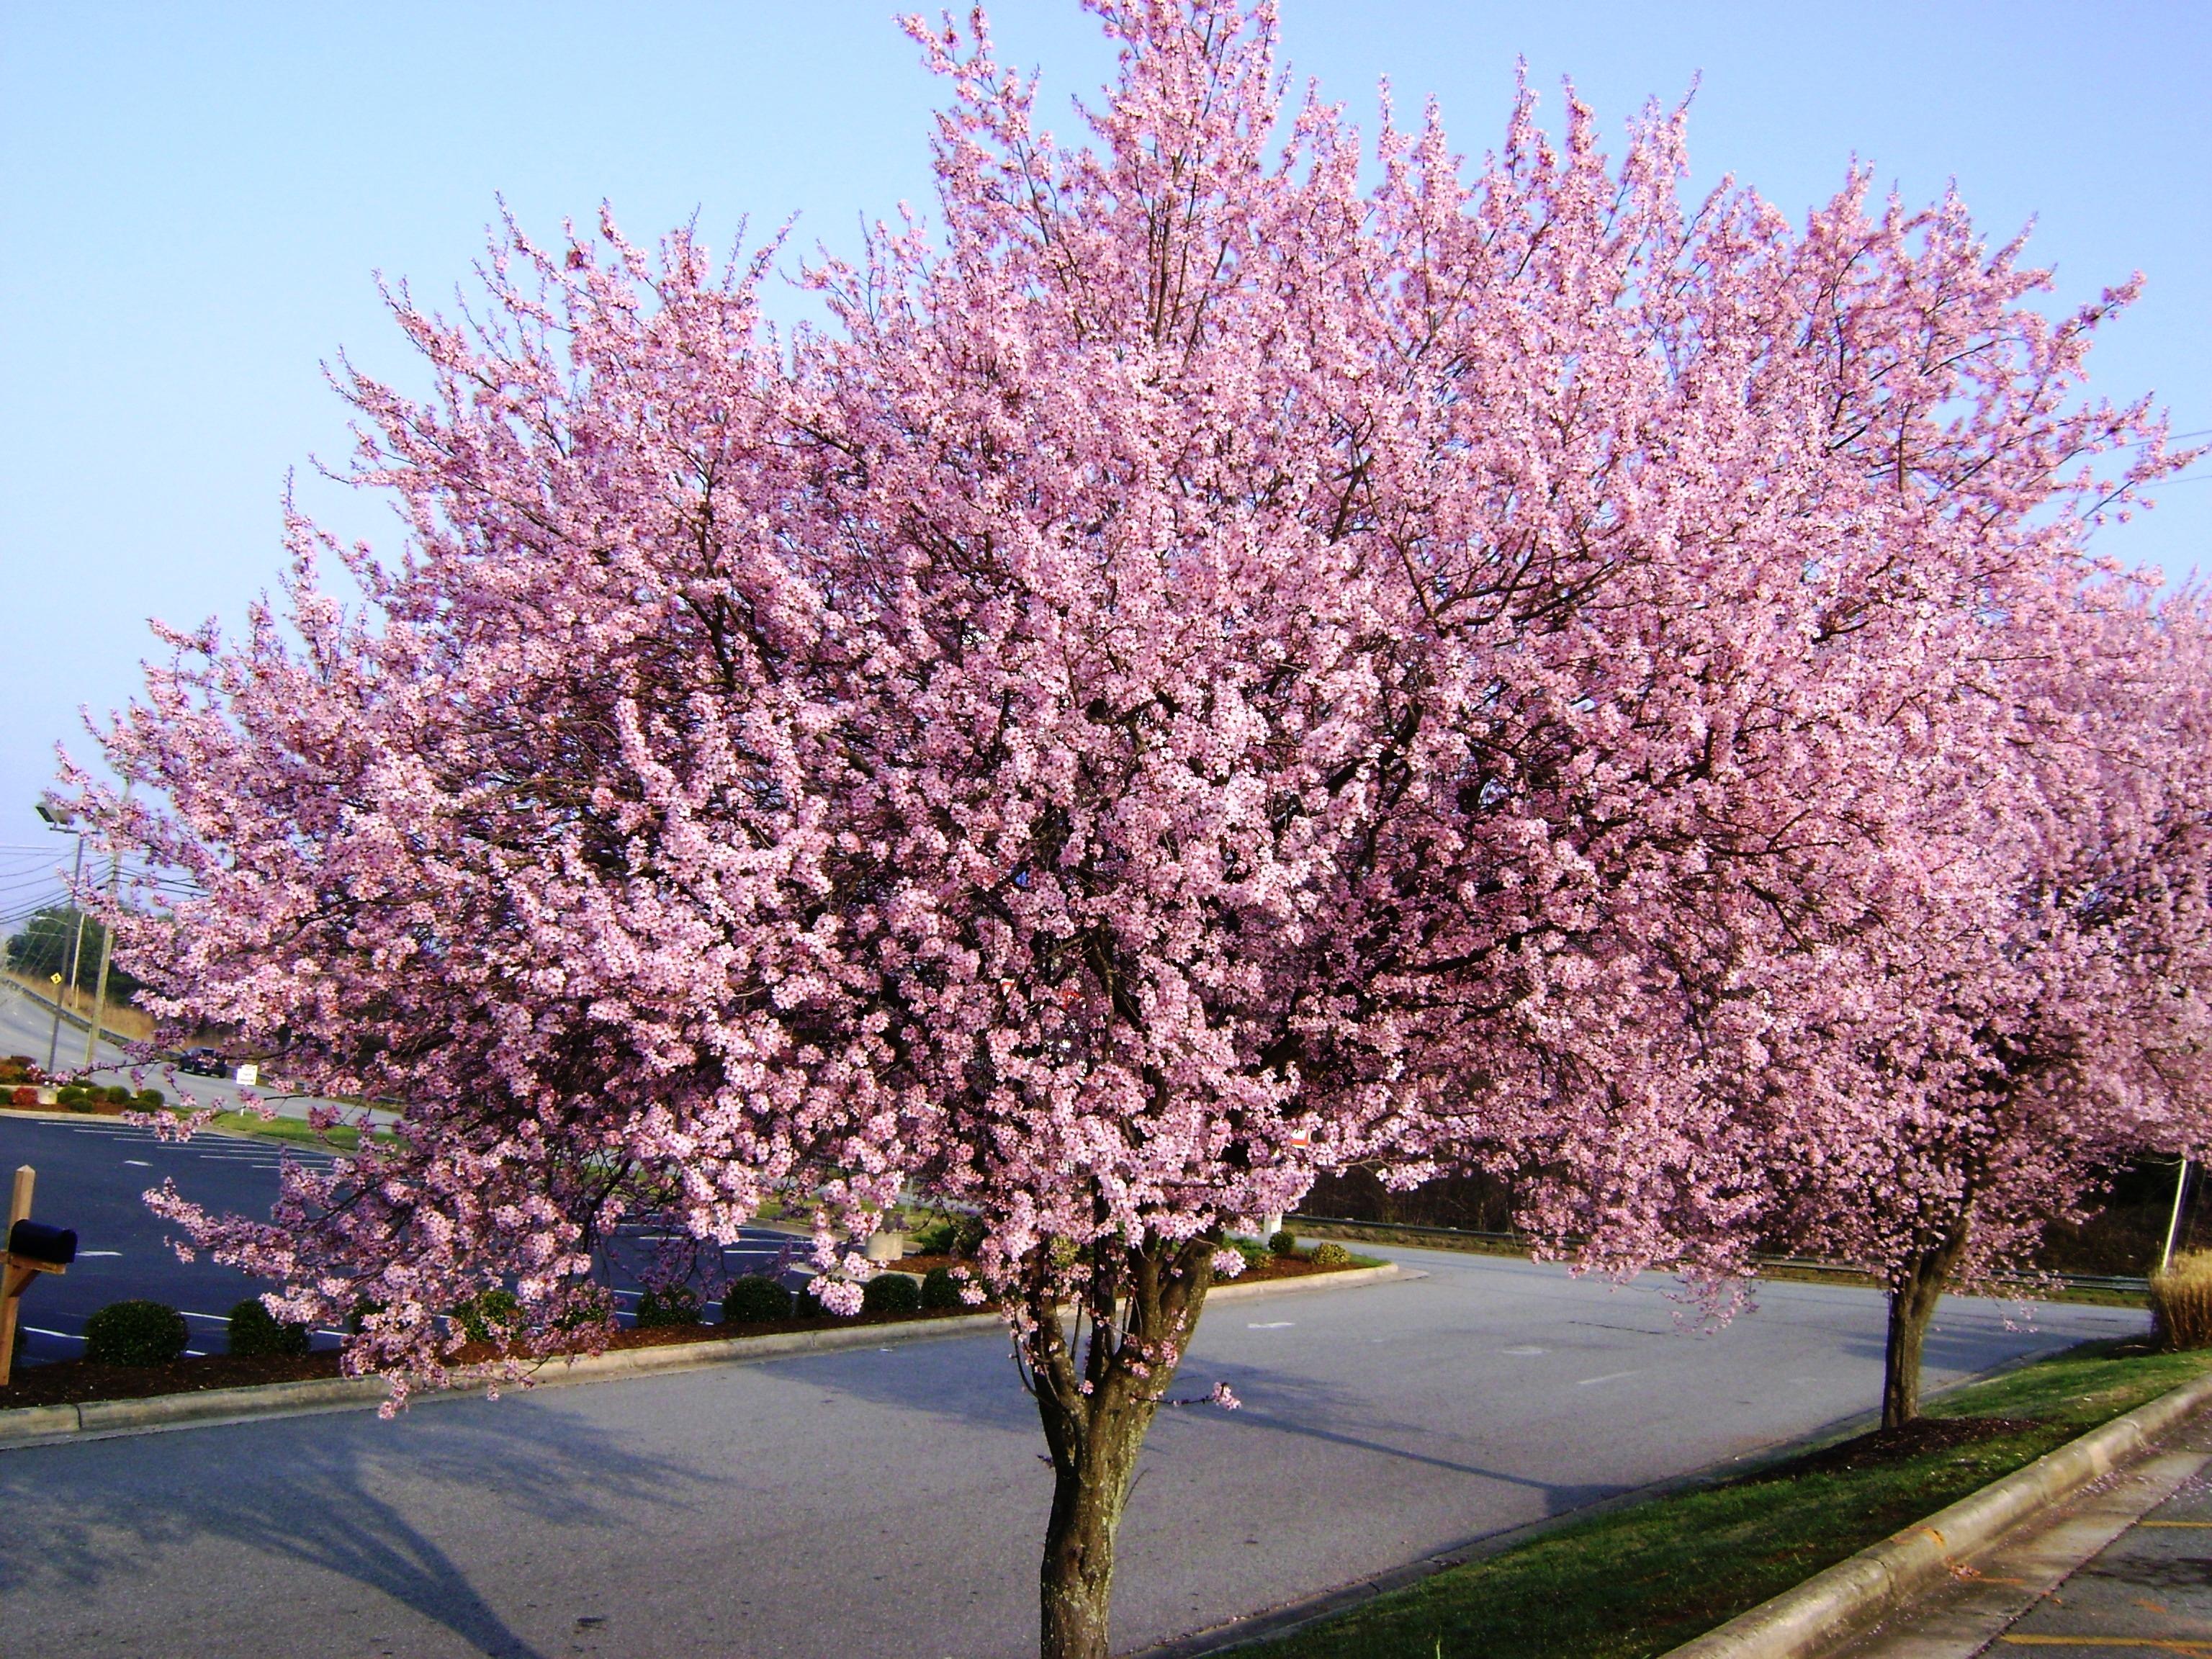 Flowering Plum Tree in Jonesville NC